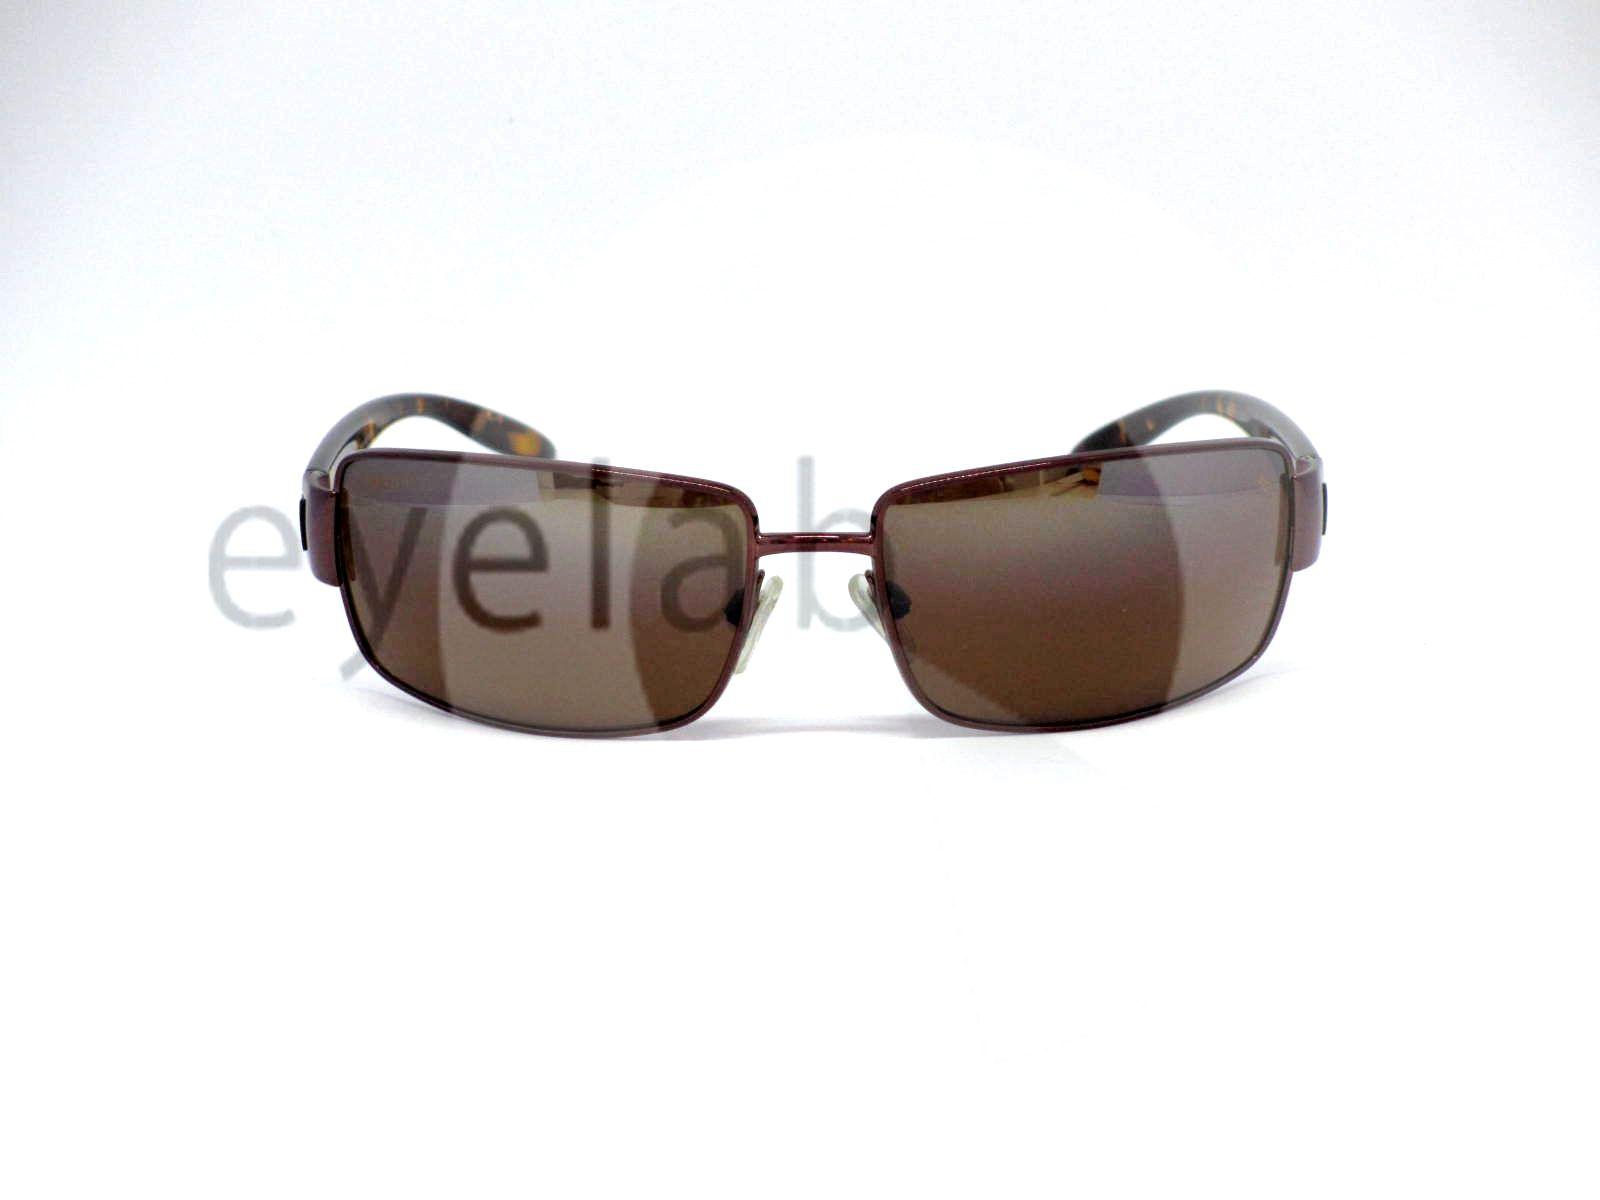 debae4c991 Γυαλιά ηλίου της εταιρίας REVO 3077 093 J4 61 Polarized ~ Eyelab